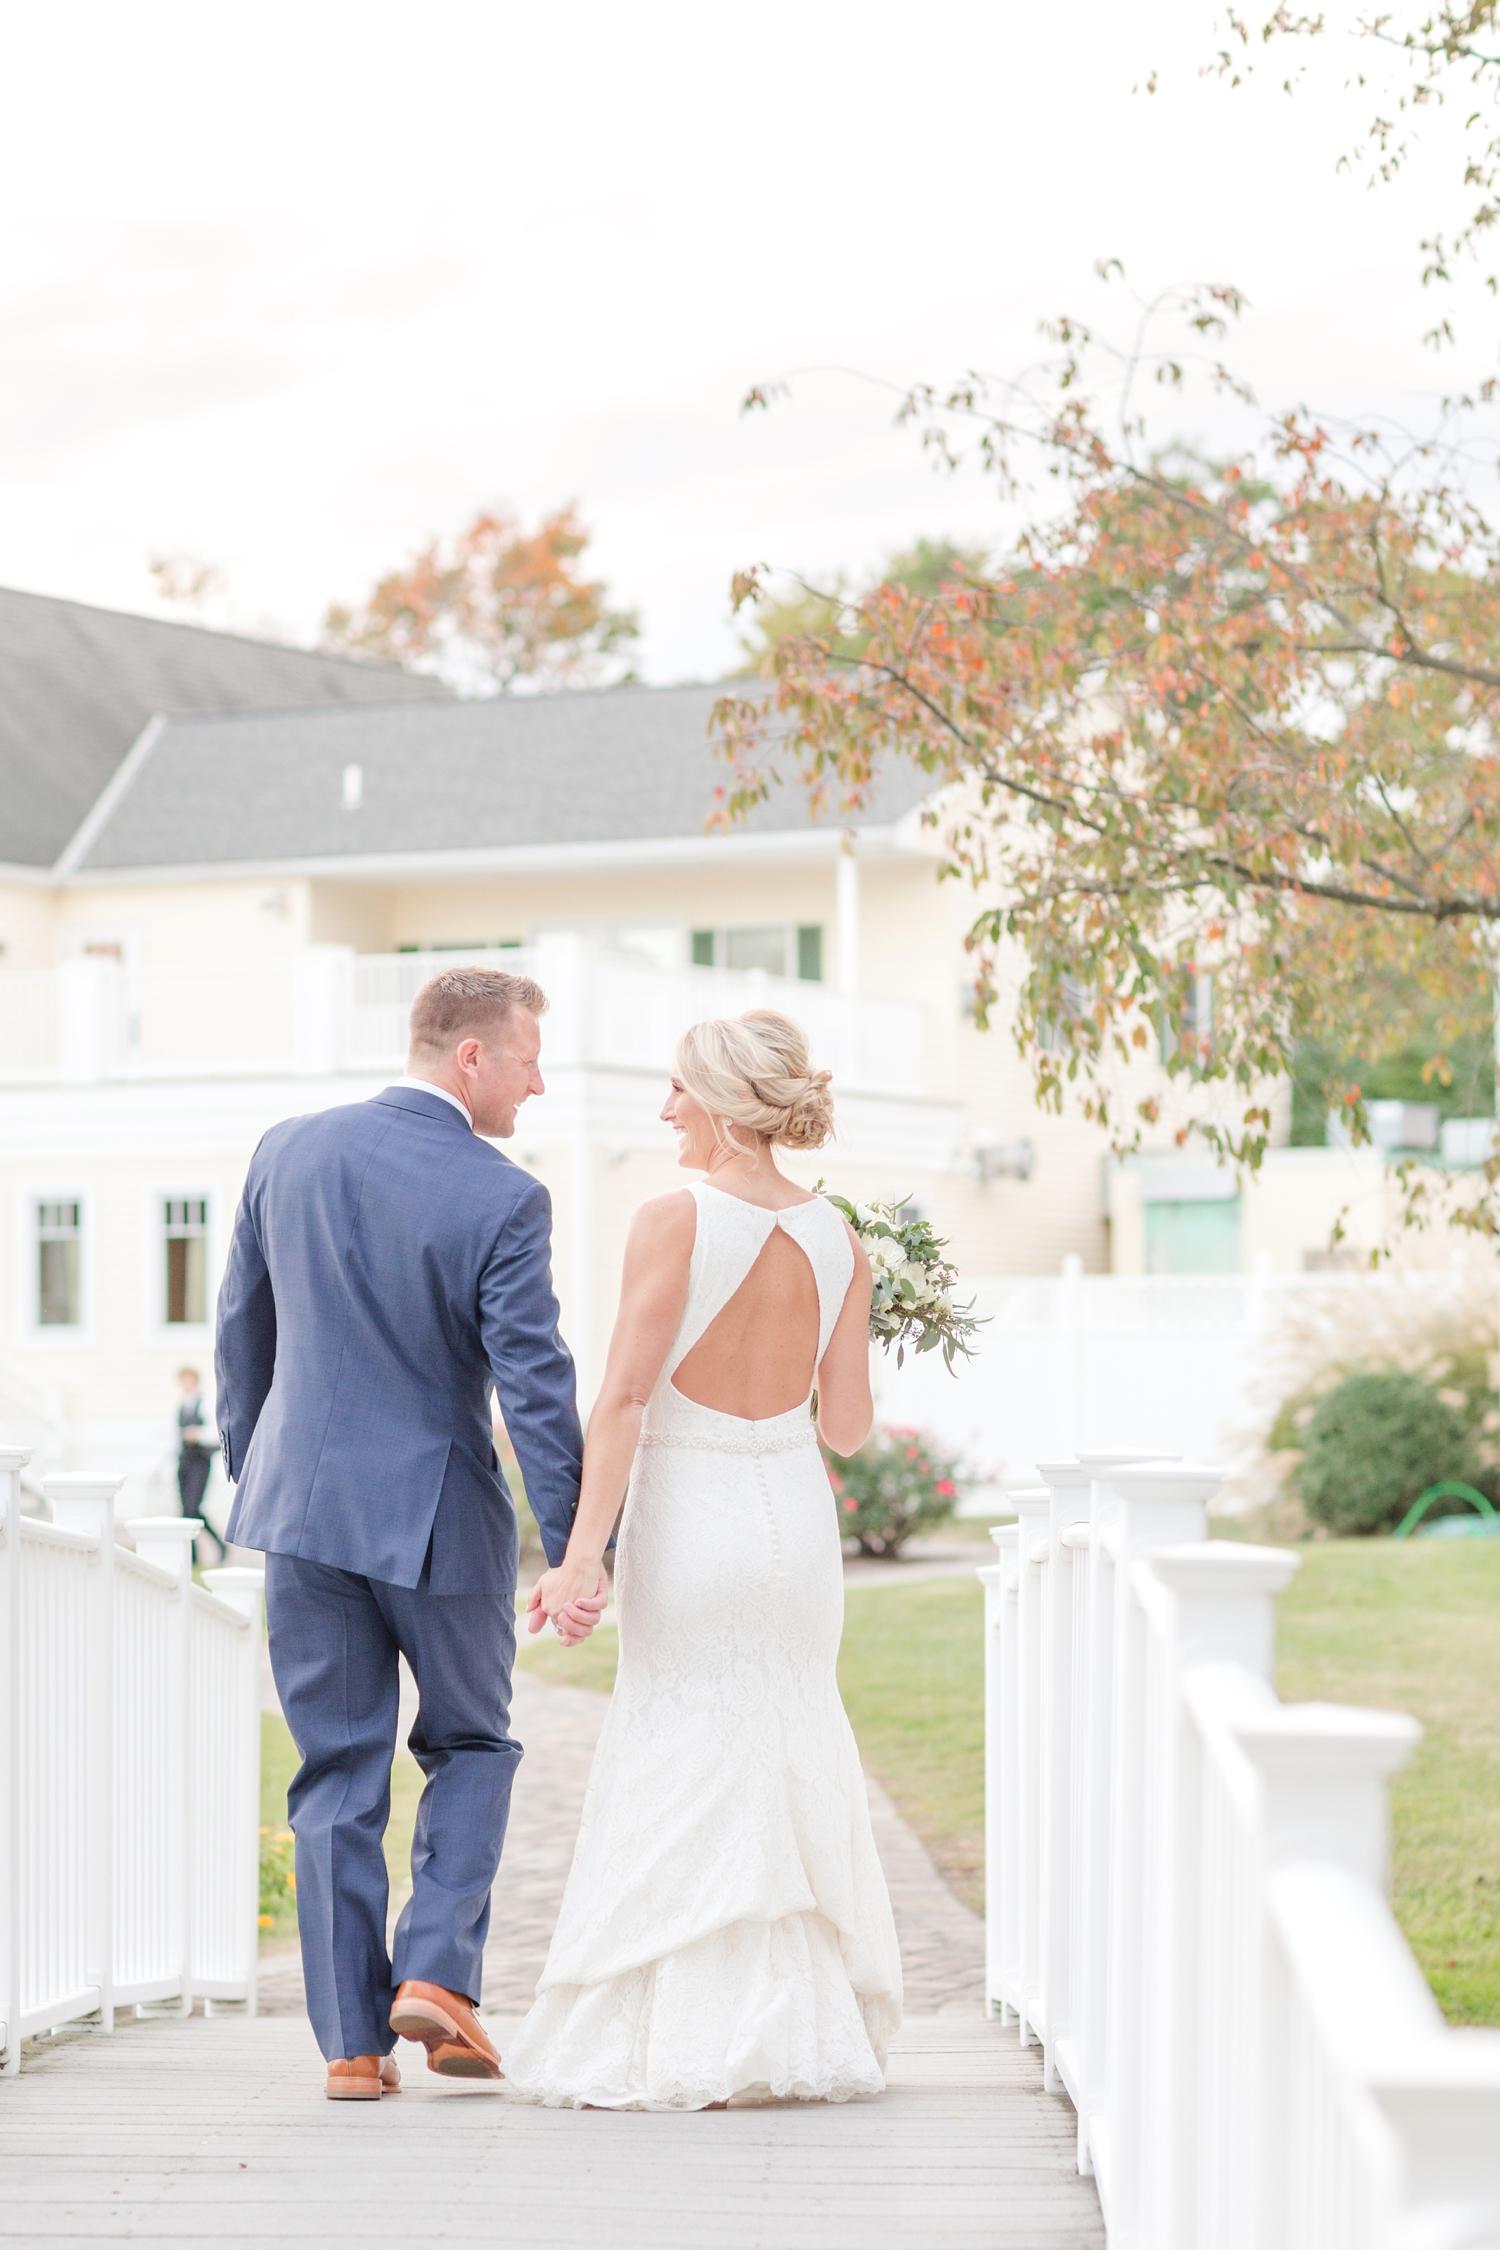 Wojciechowski Wedding-429_the-oaks-waterfront-inn-wedding-easton-maryland-wedding-photography-anna-grace-photography-photo.jpg